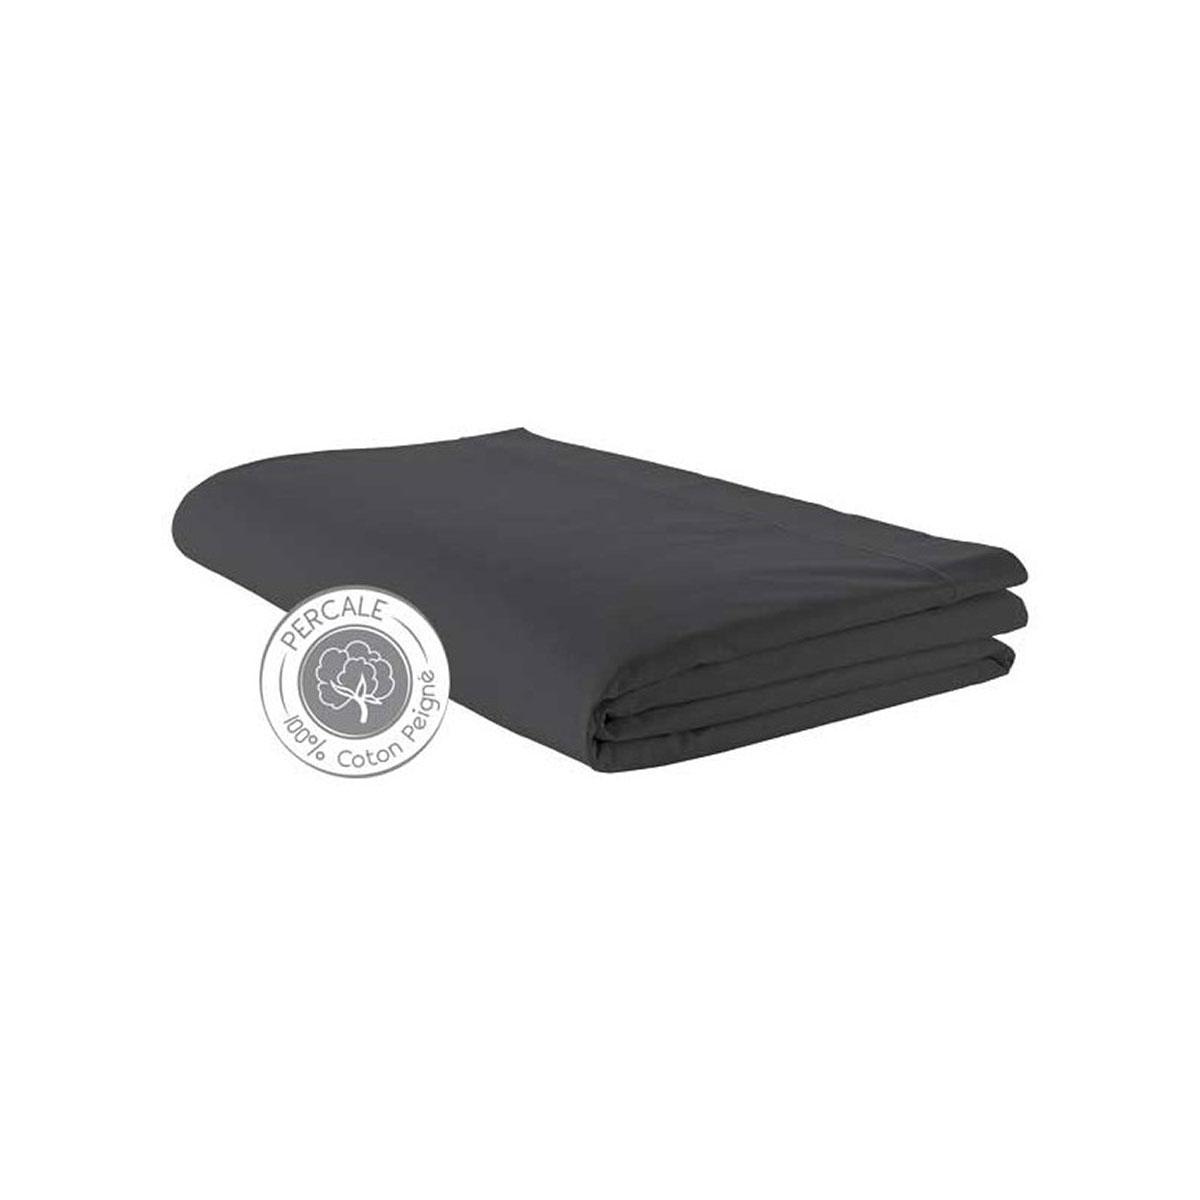 Drap percale 280x325 cm uni coton anthracite 325x280